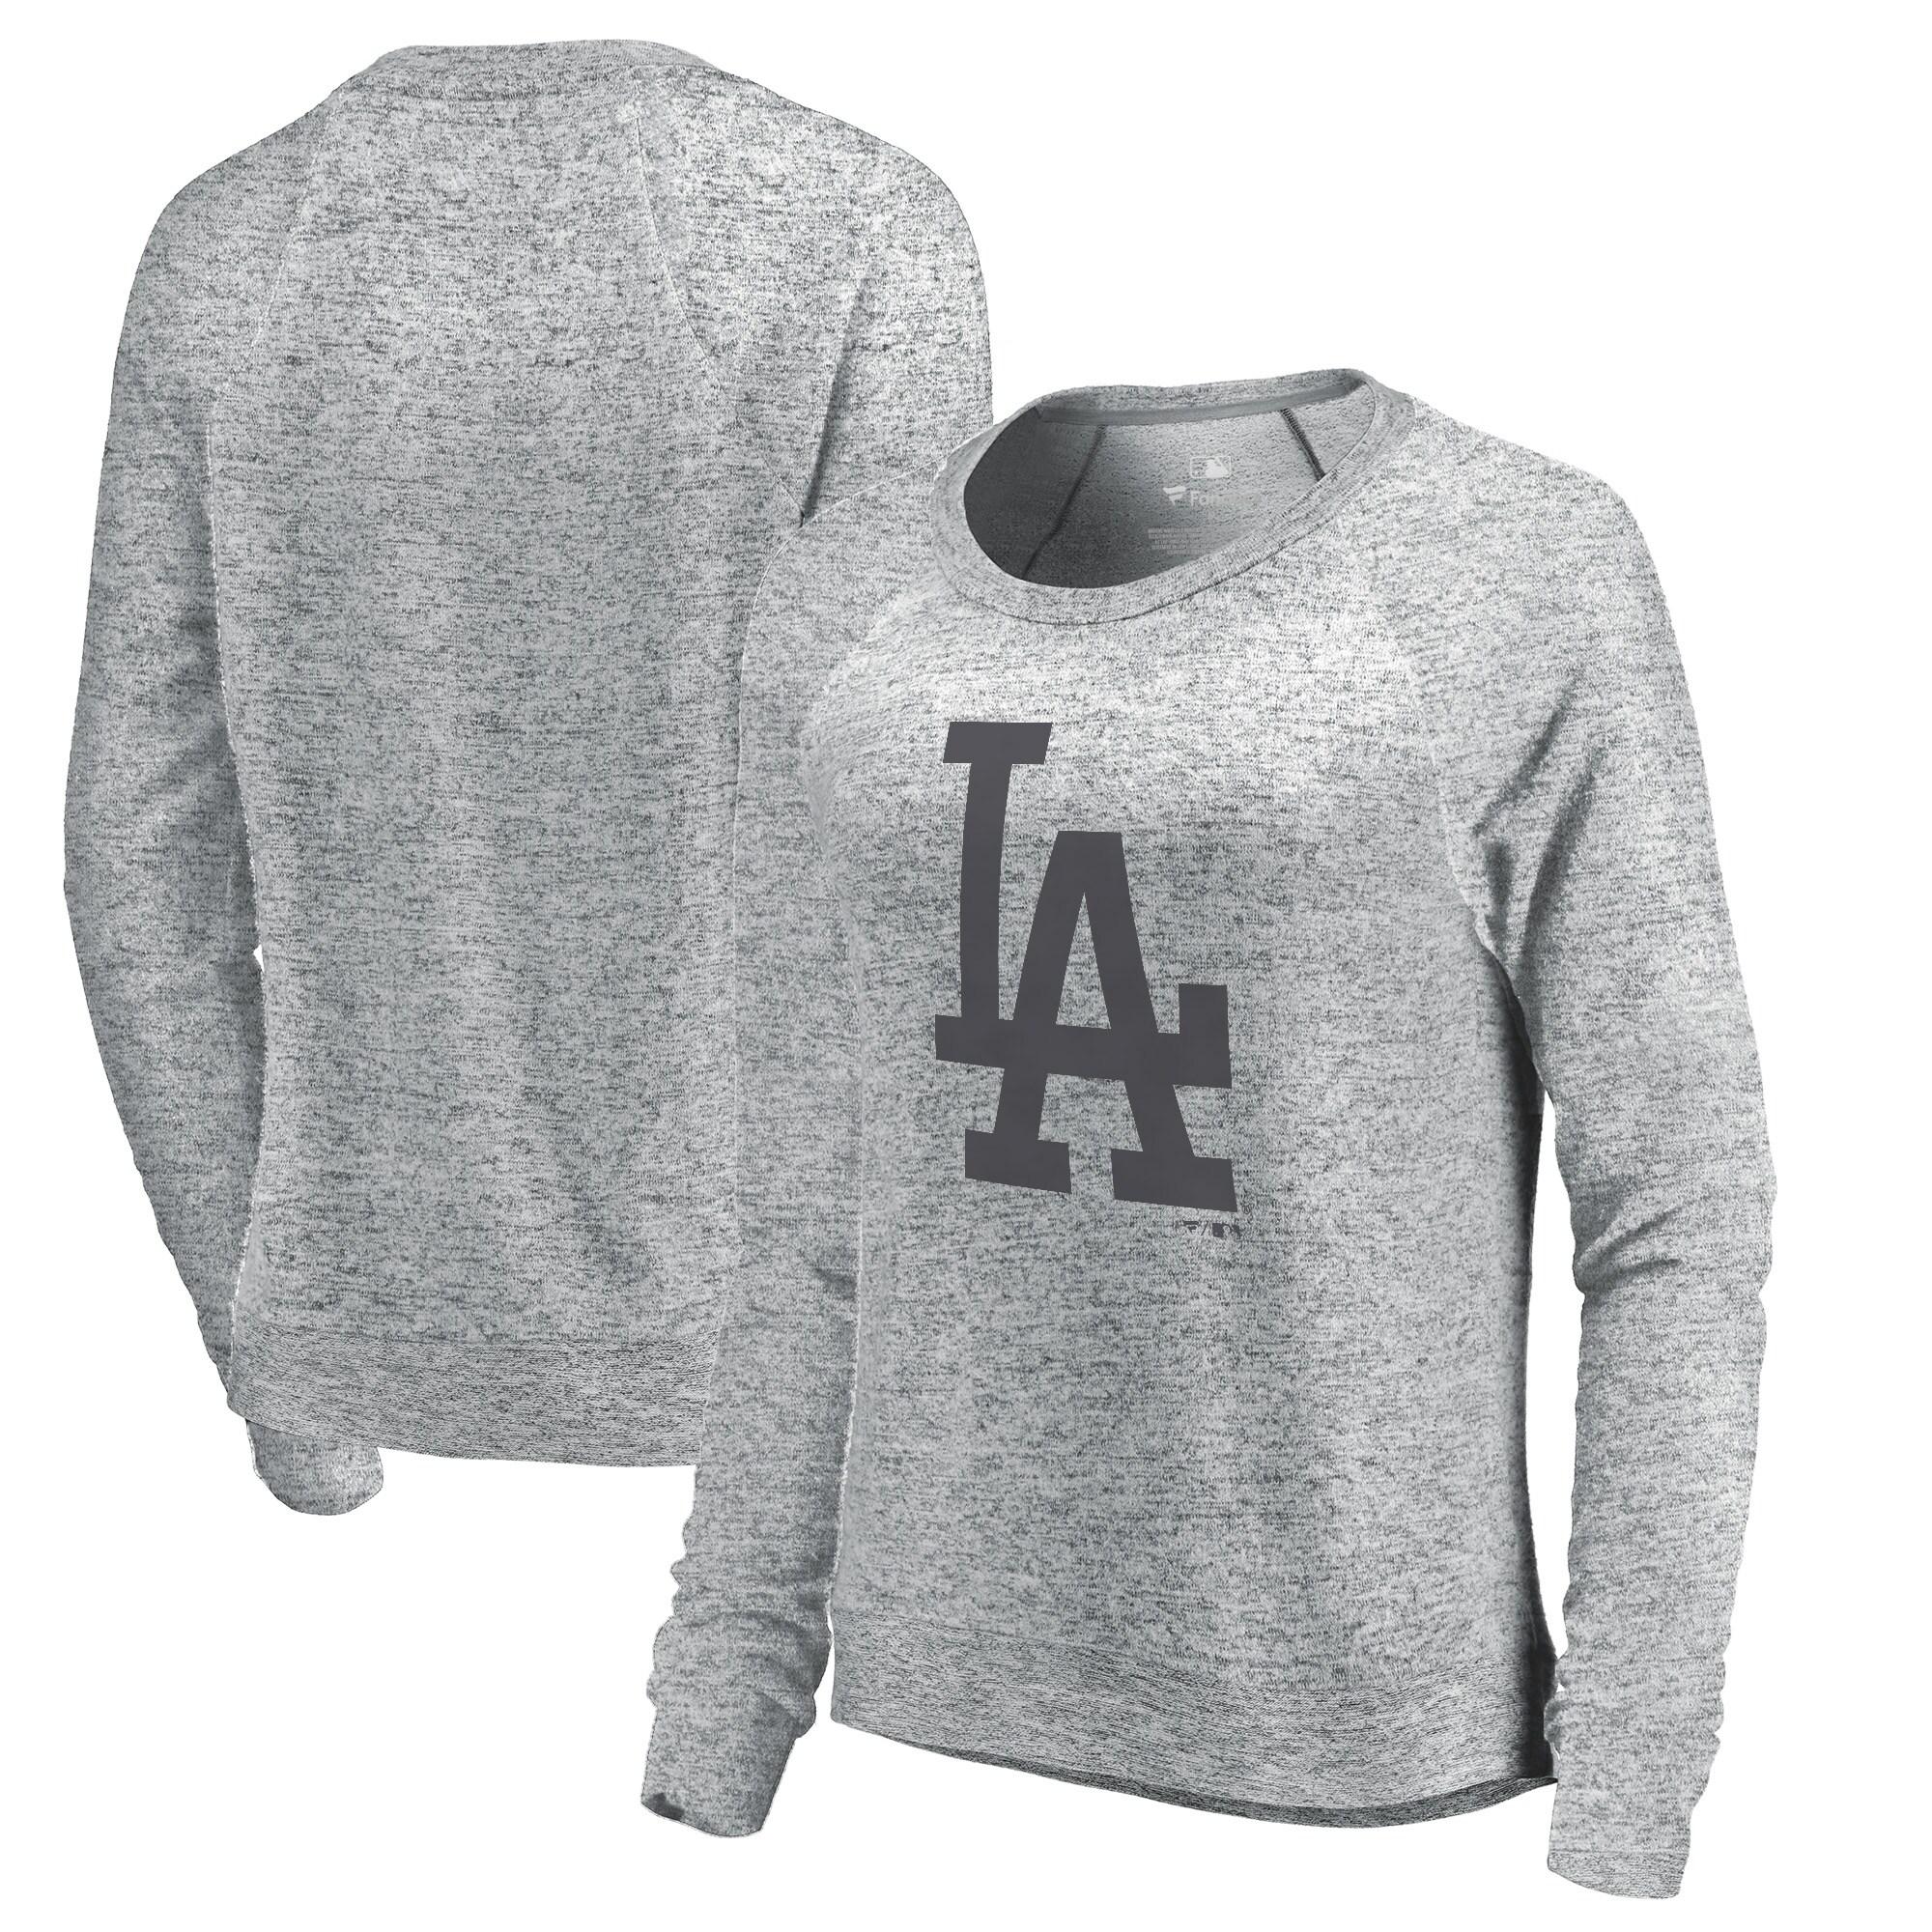 Los Angeles Dodgers Let Loose by RNL Women's Cozy Collection Plush Raglan Tri-Blend Sweatshirt - Ash